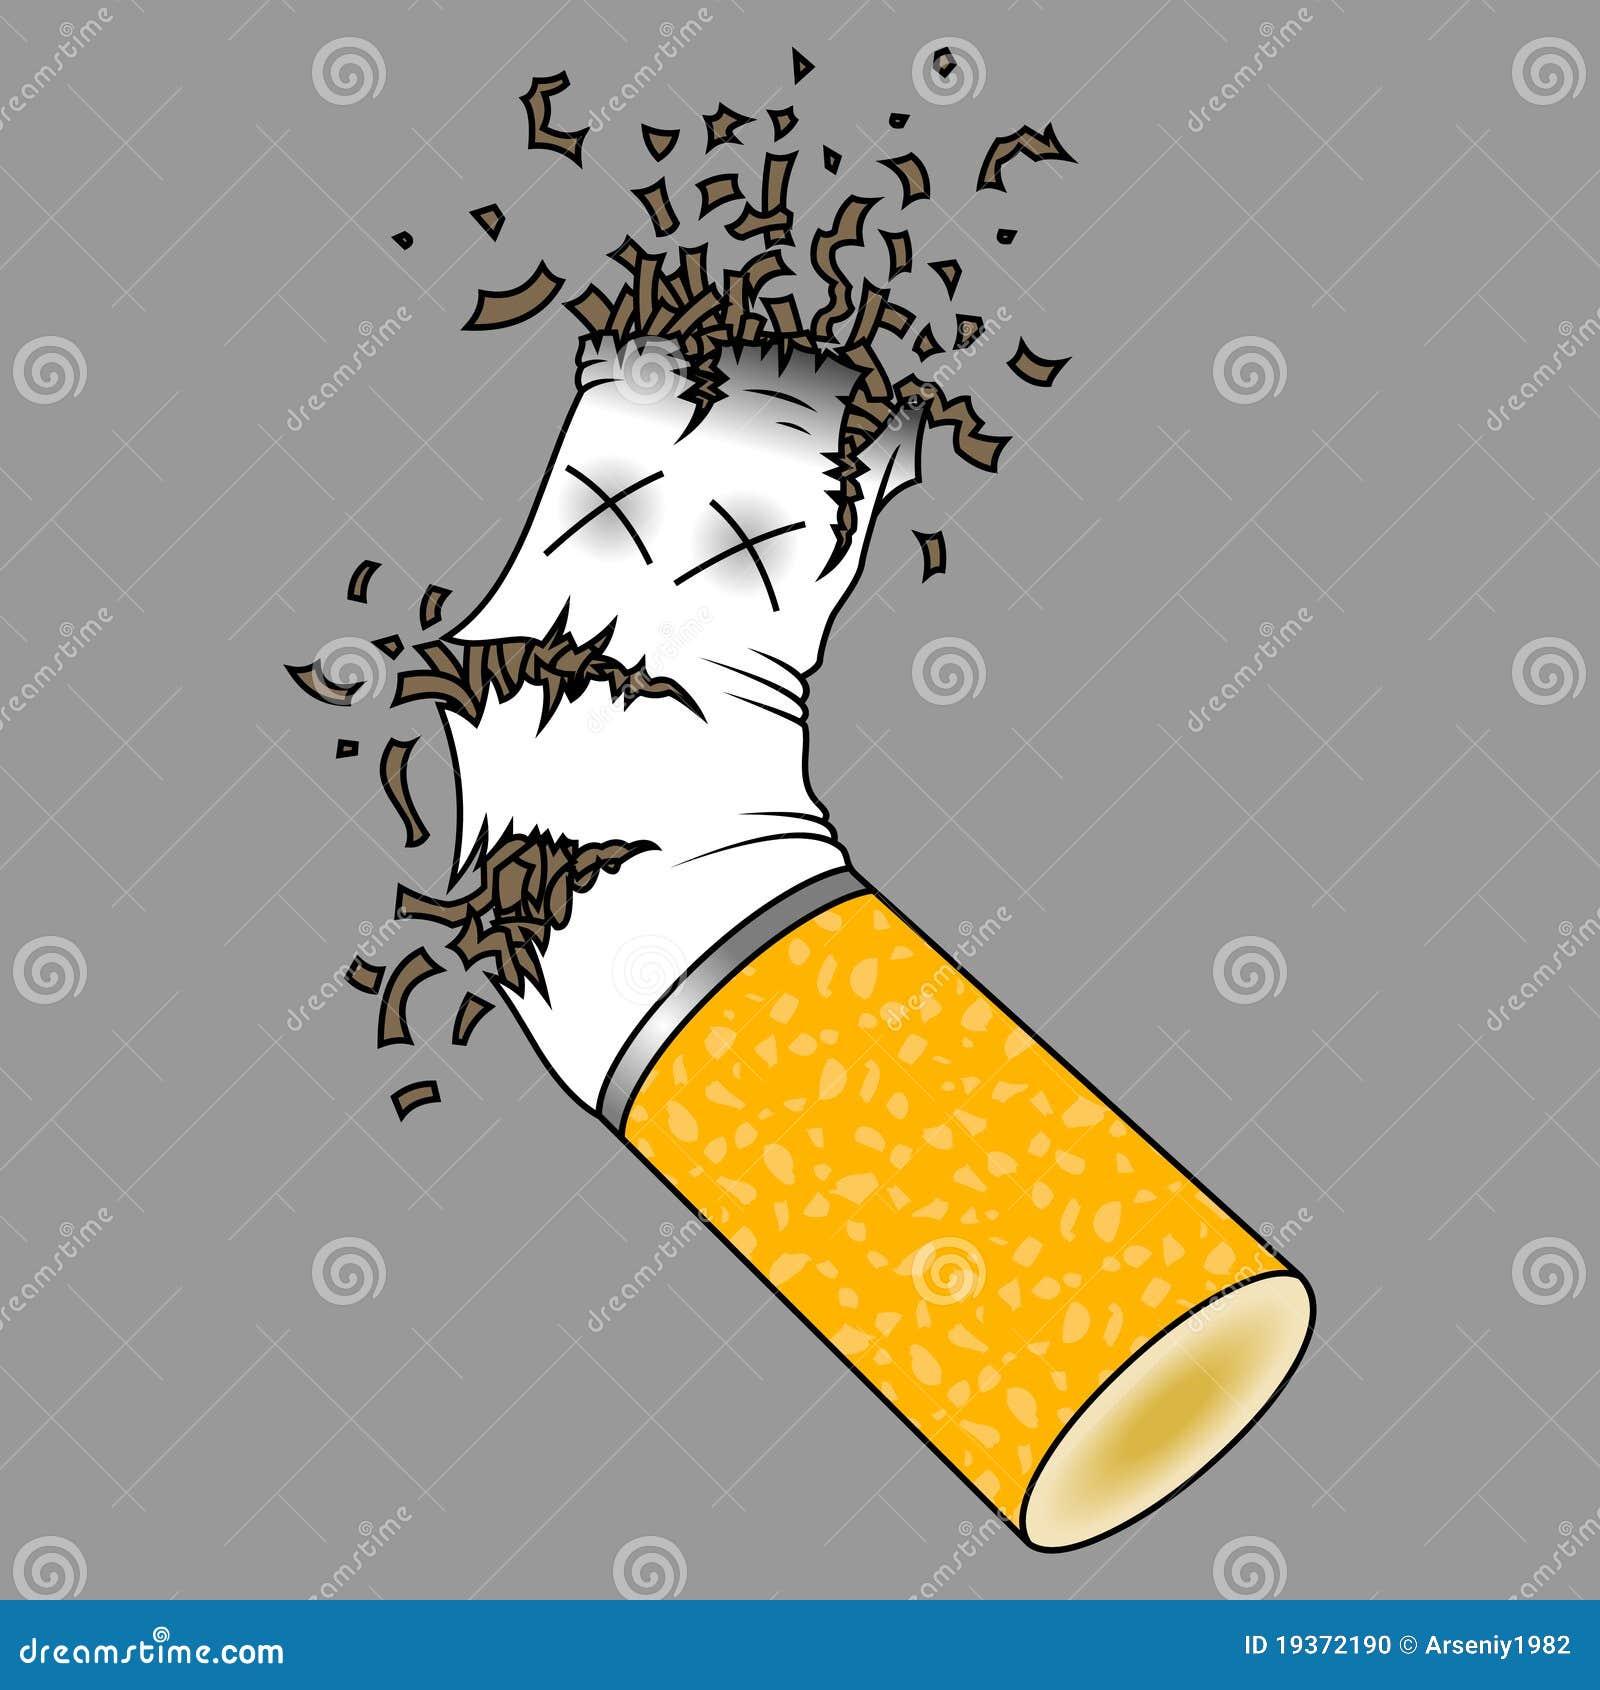 Ponta de cigarro esmagada